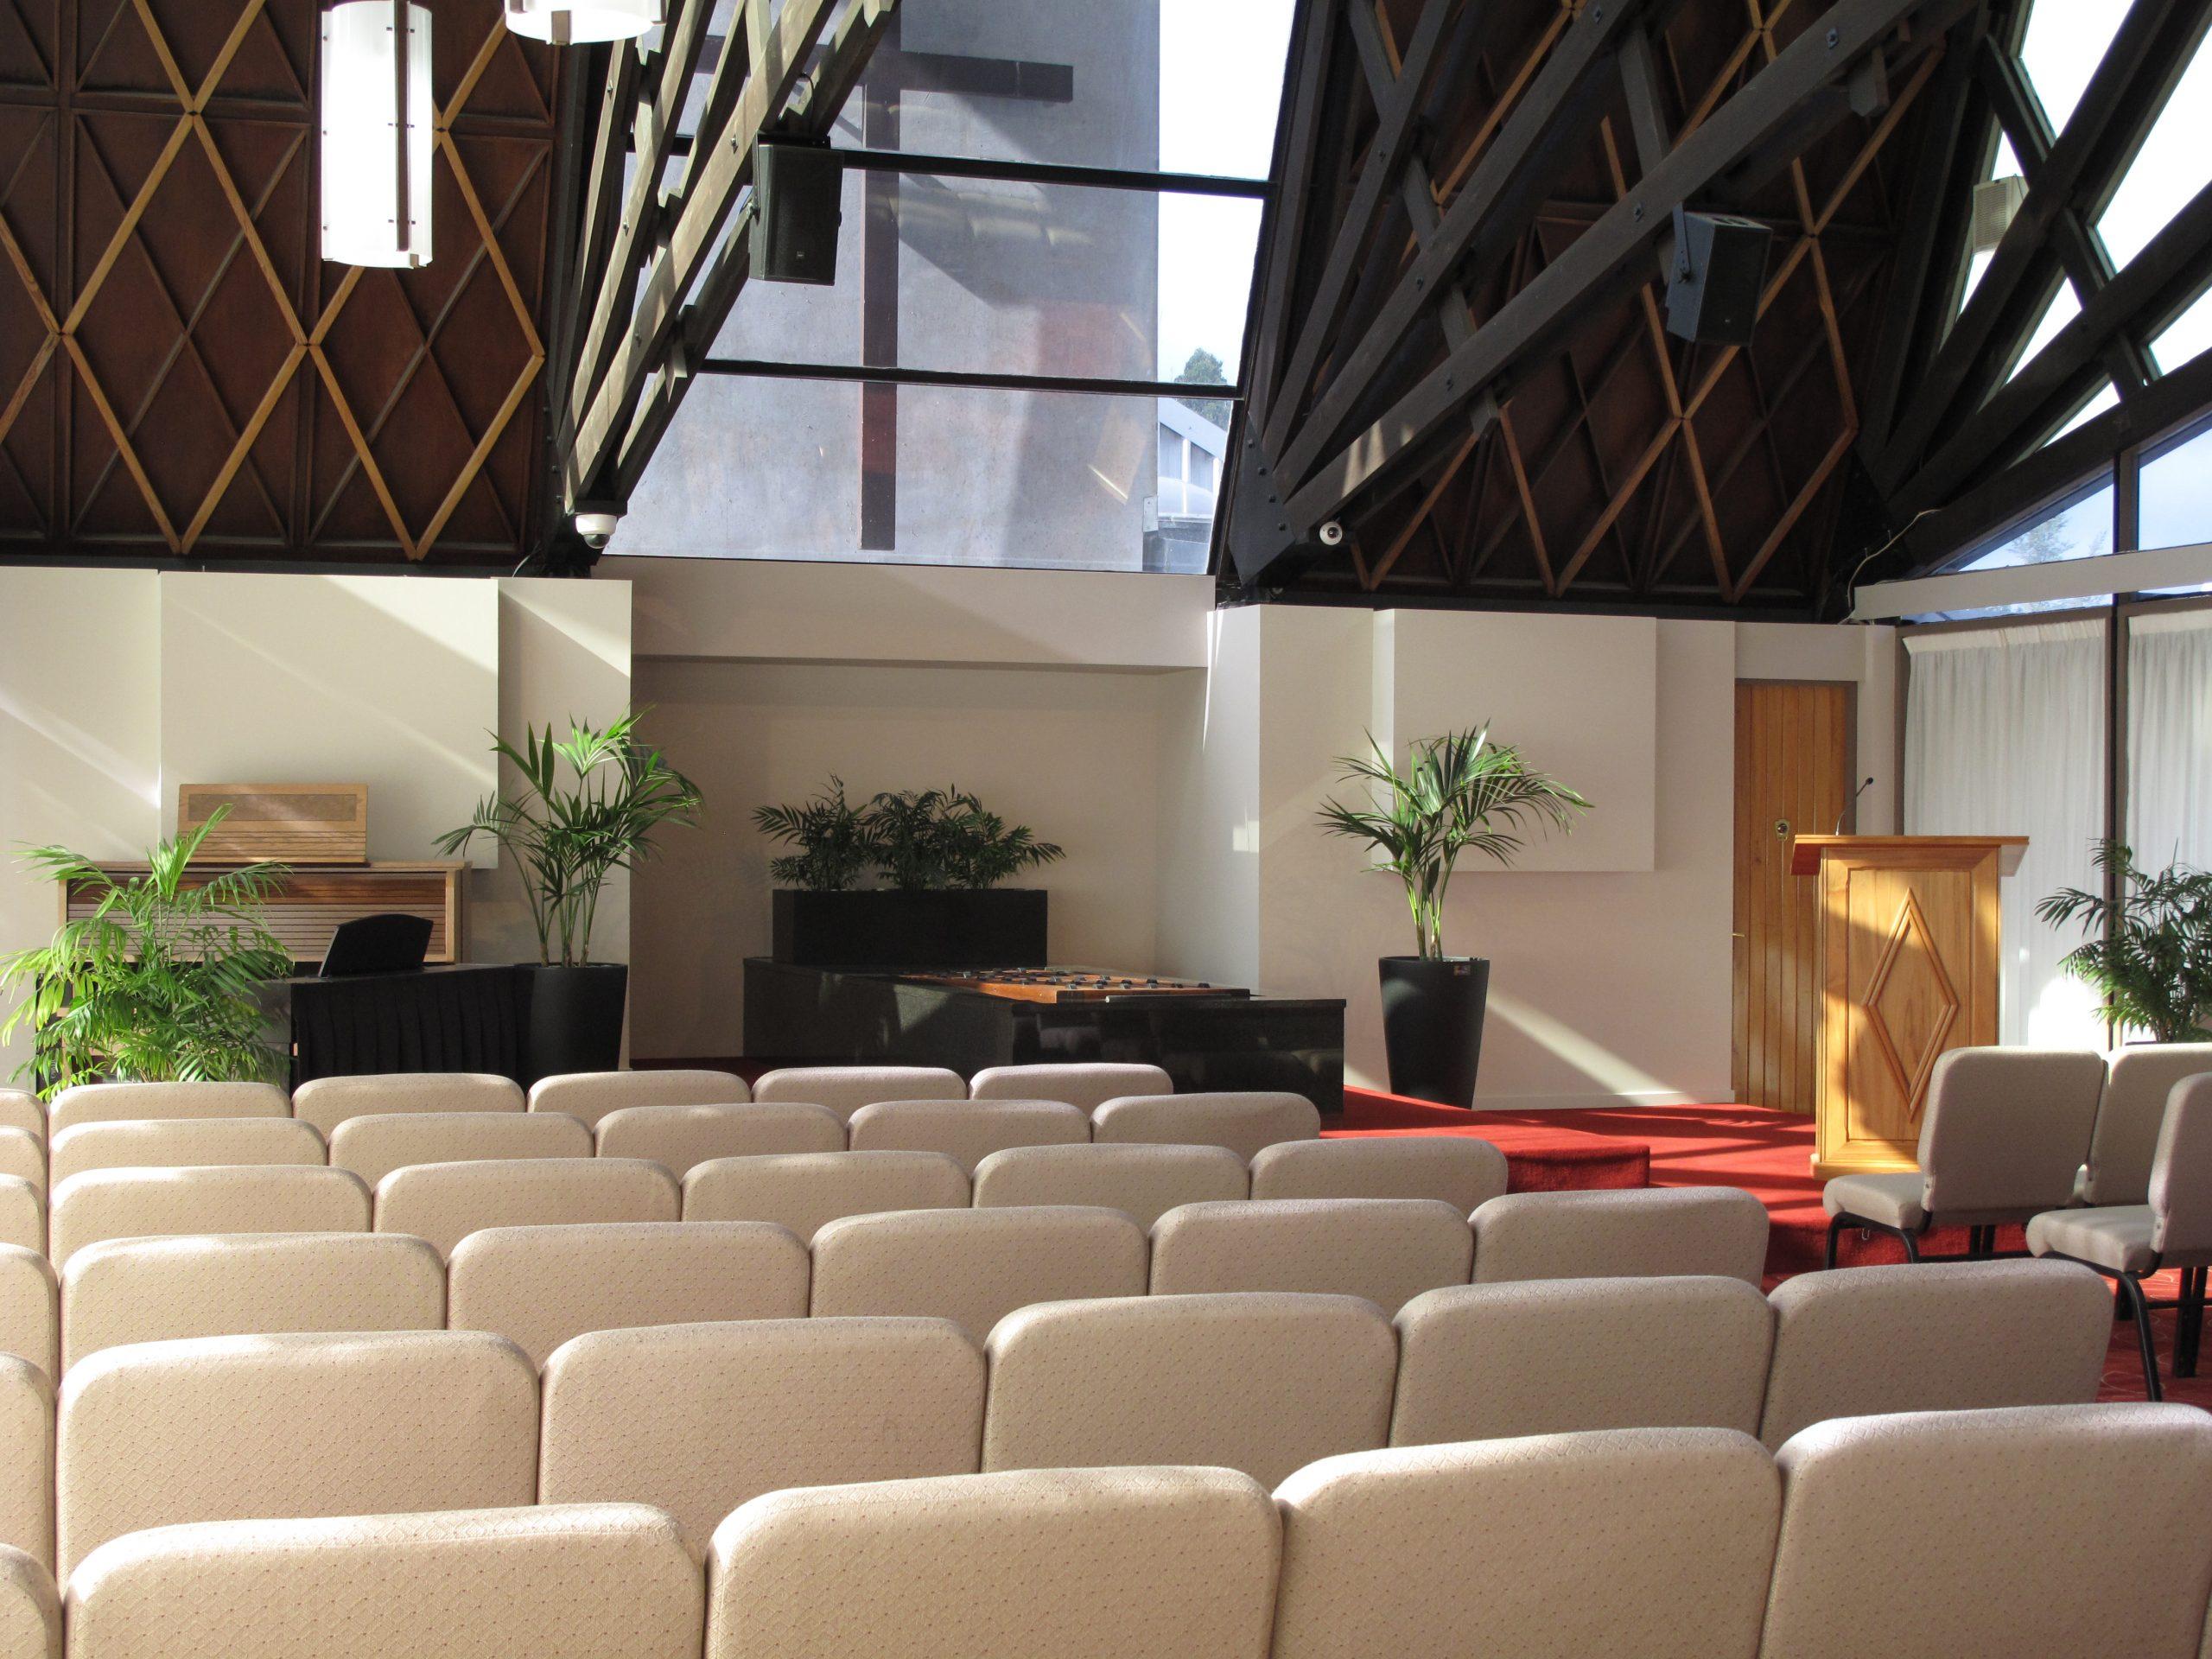 Harewood Crematorium Inside - Venues | Bell, Lamb & Trotter